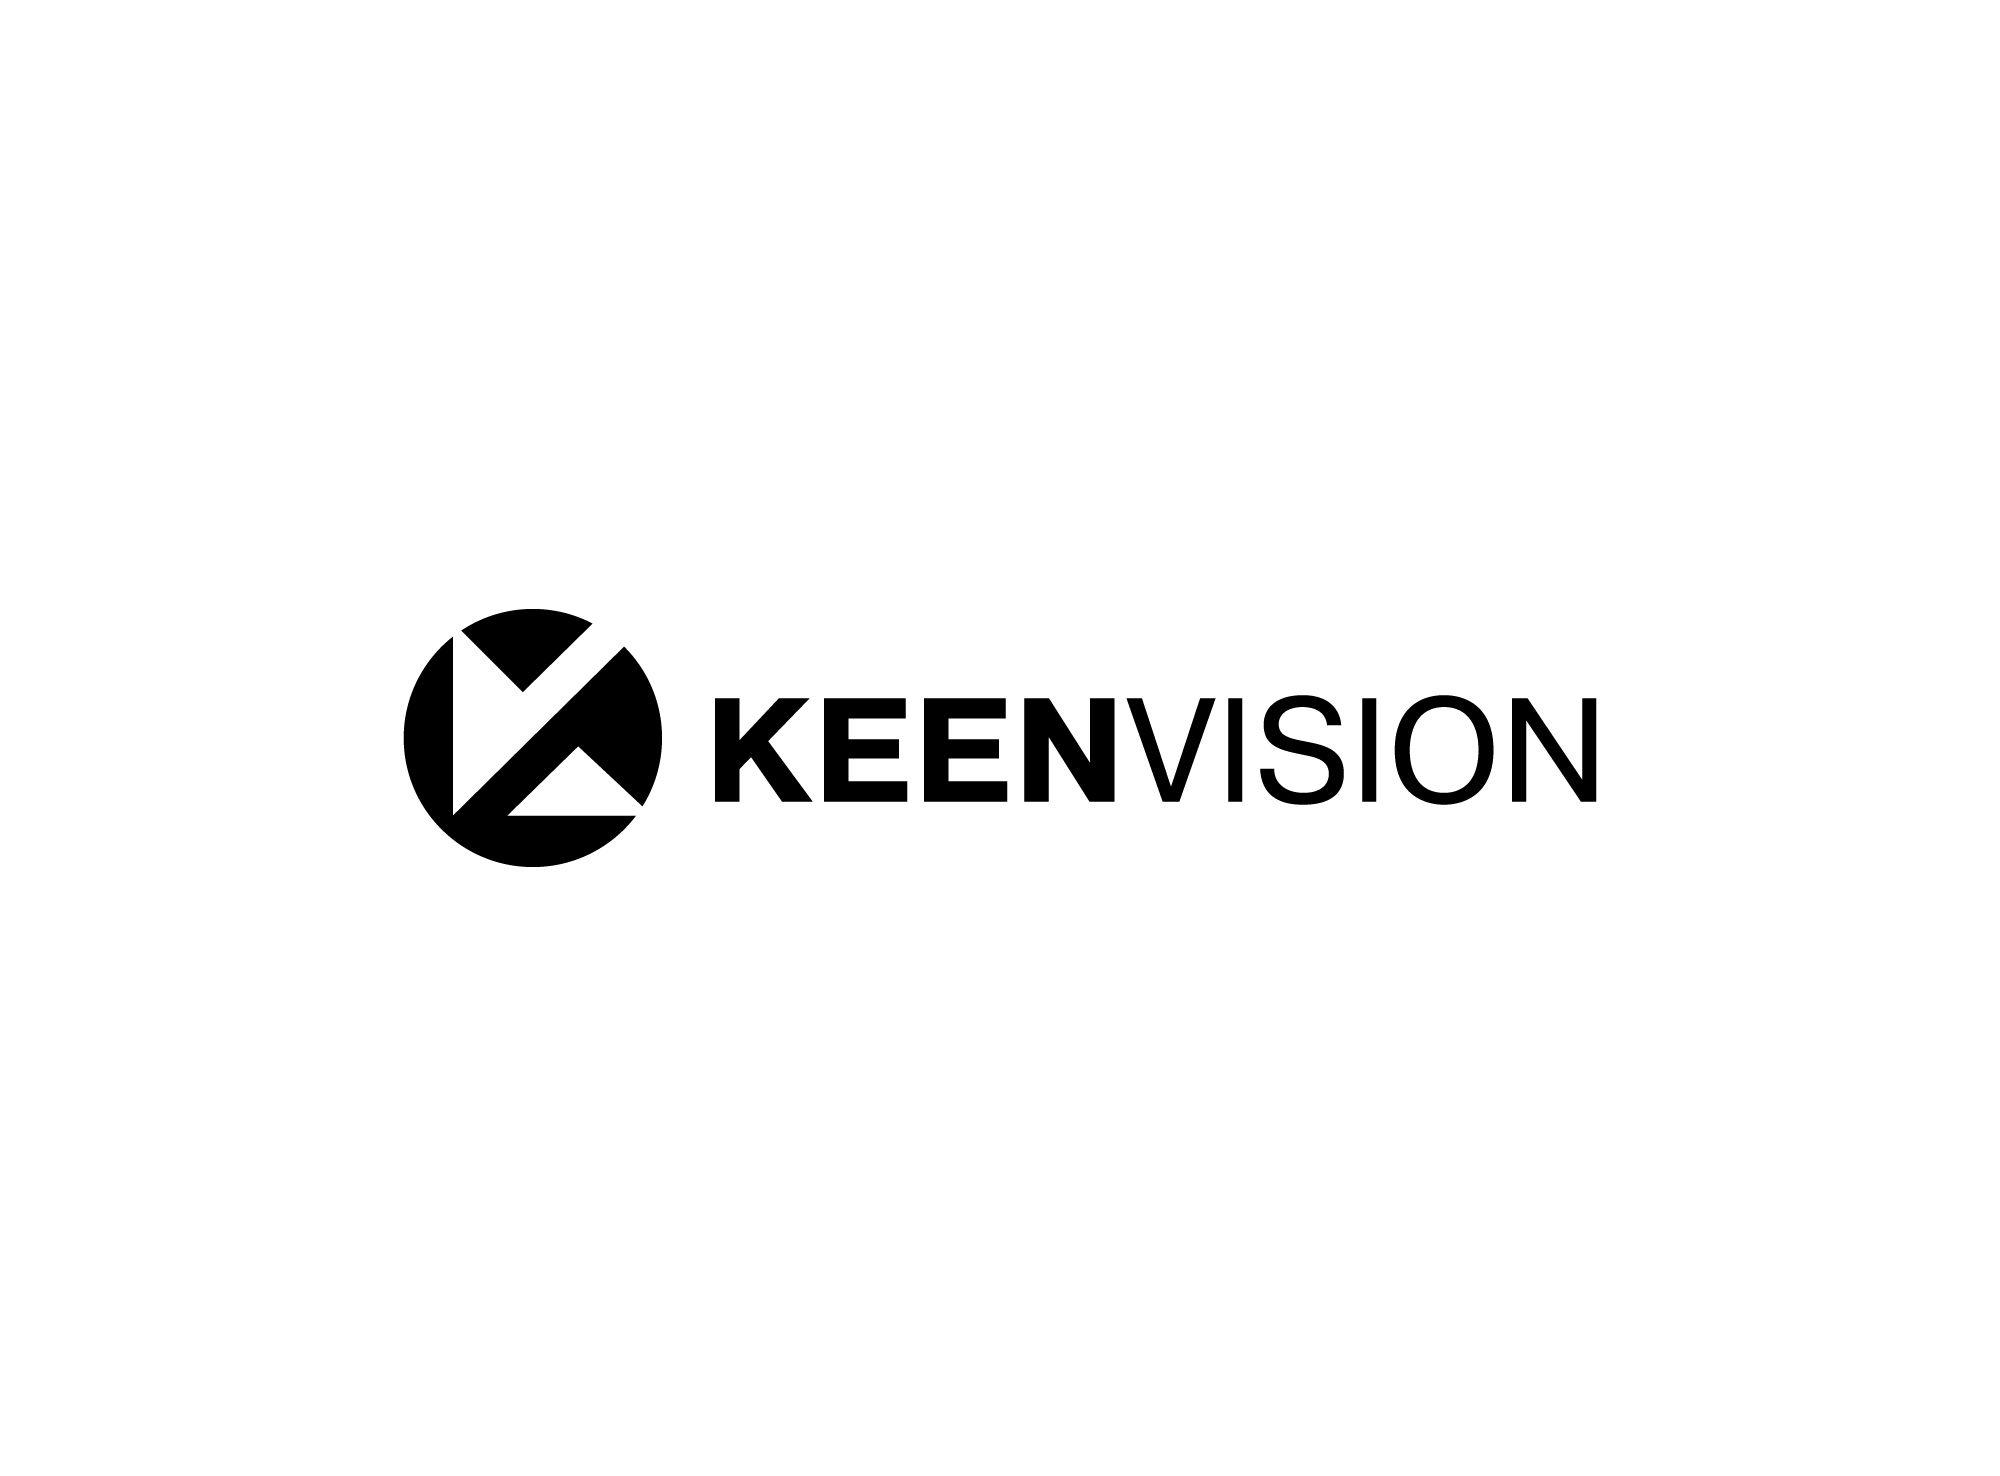 Логотип для KeenVision - дизайнер shamaevserg